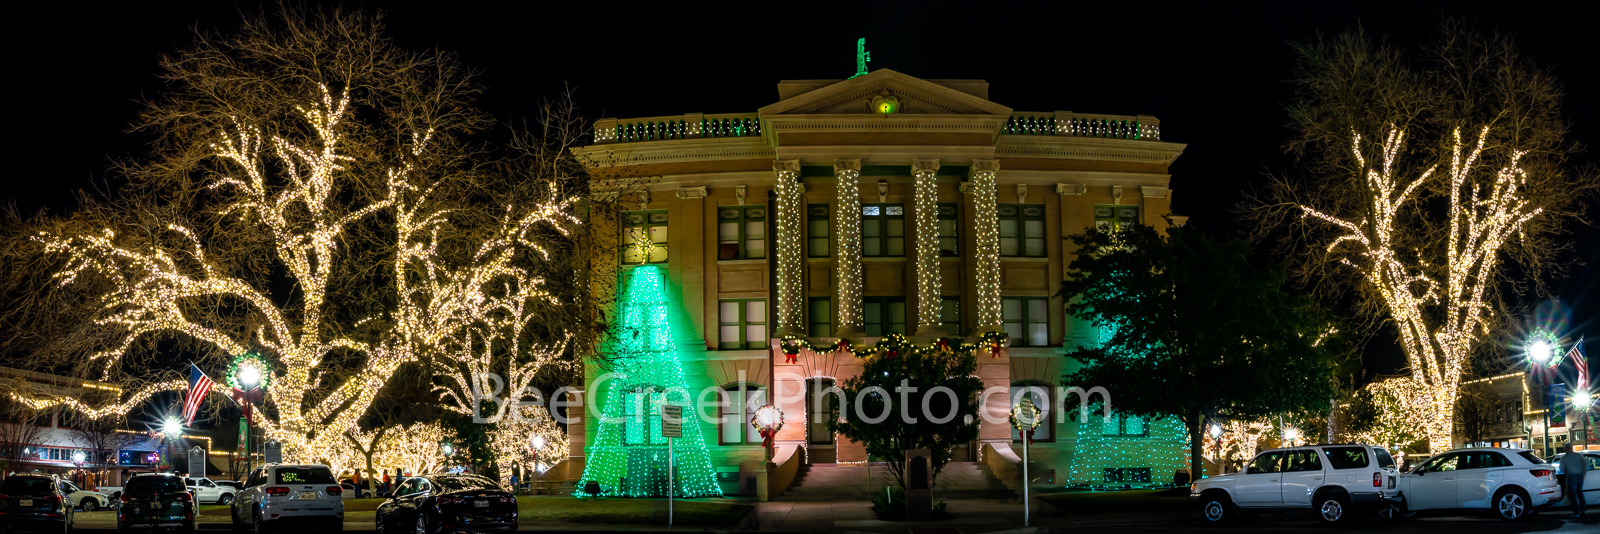 georgetown texas christmas, georgetown, texas, christmas, downtown, city, , christmas lights, holiday decorations, square, town square,  night, texas christmas, panorama, pano, , photo